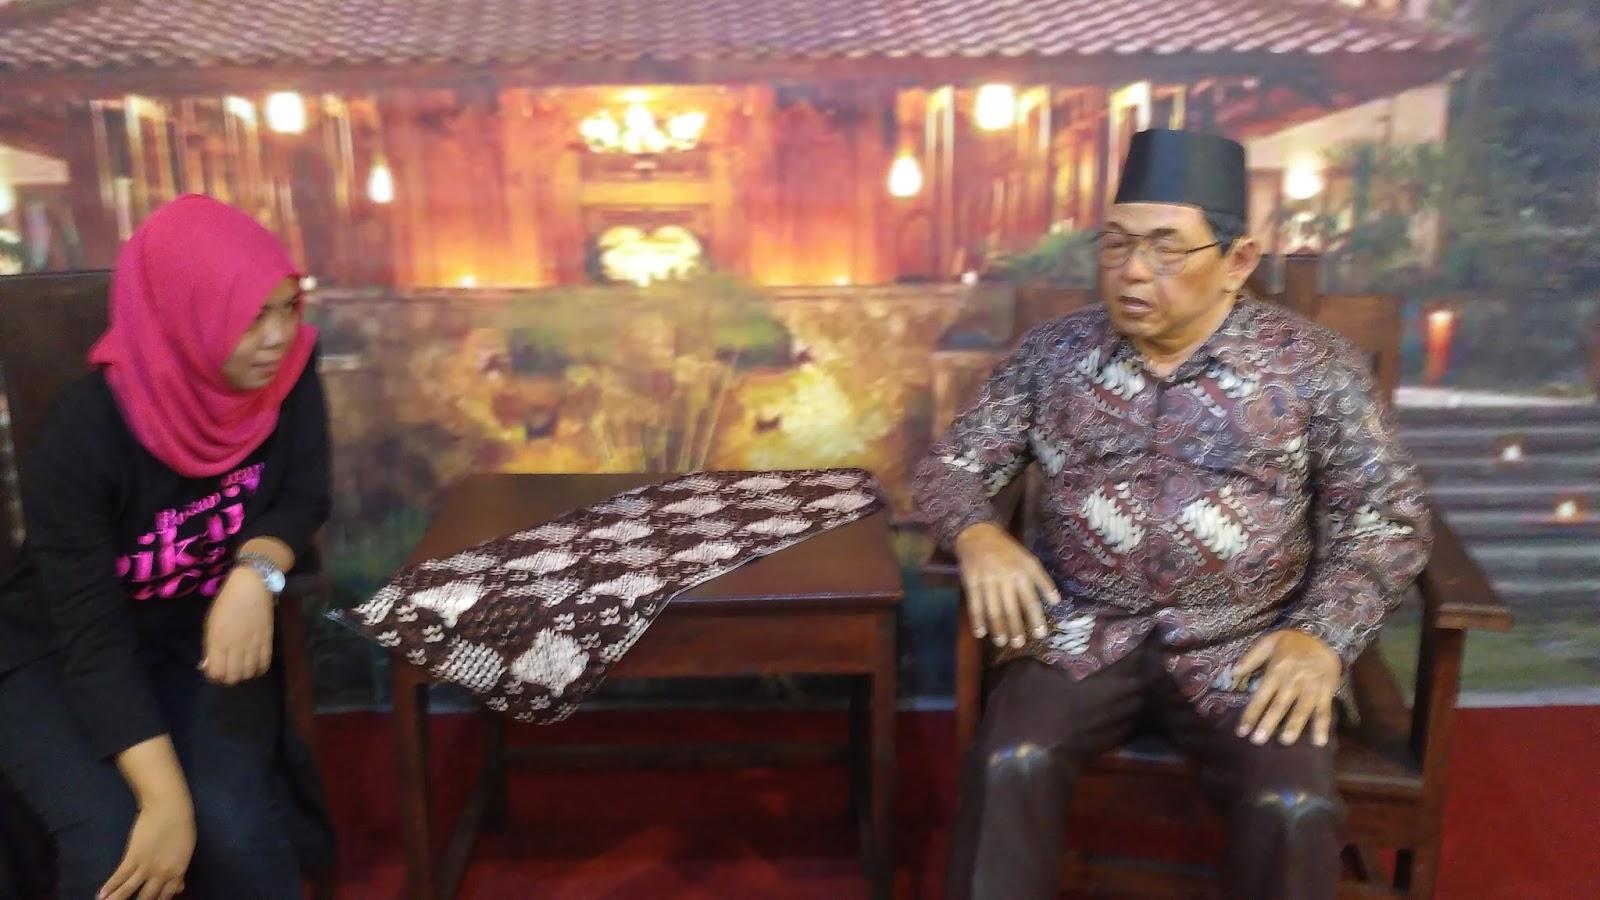 Serunya Ngetrick Mata Museum De Arca Yogyakarta Jurnal Kota